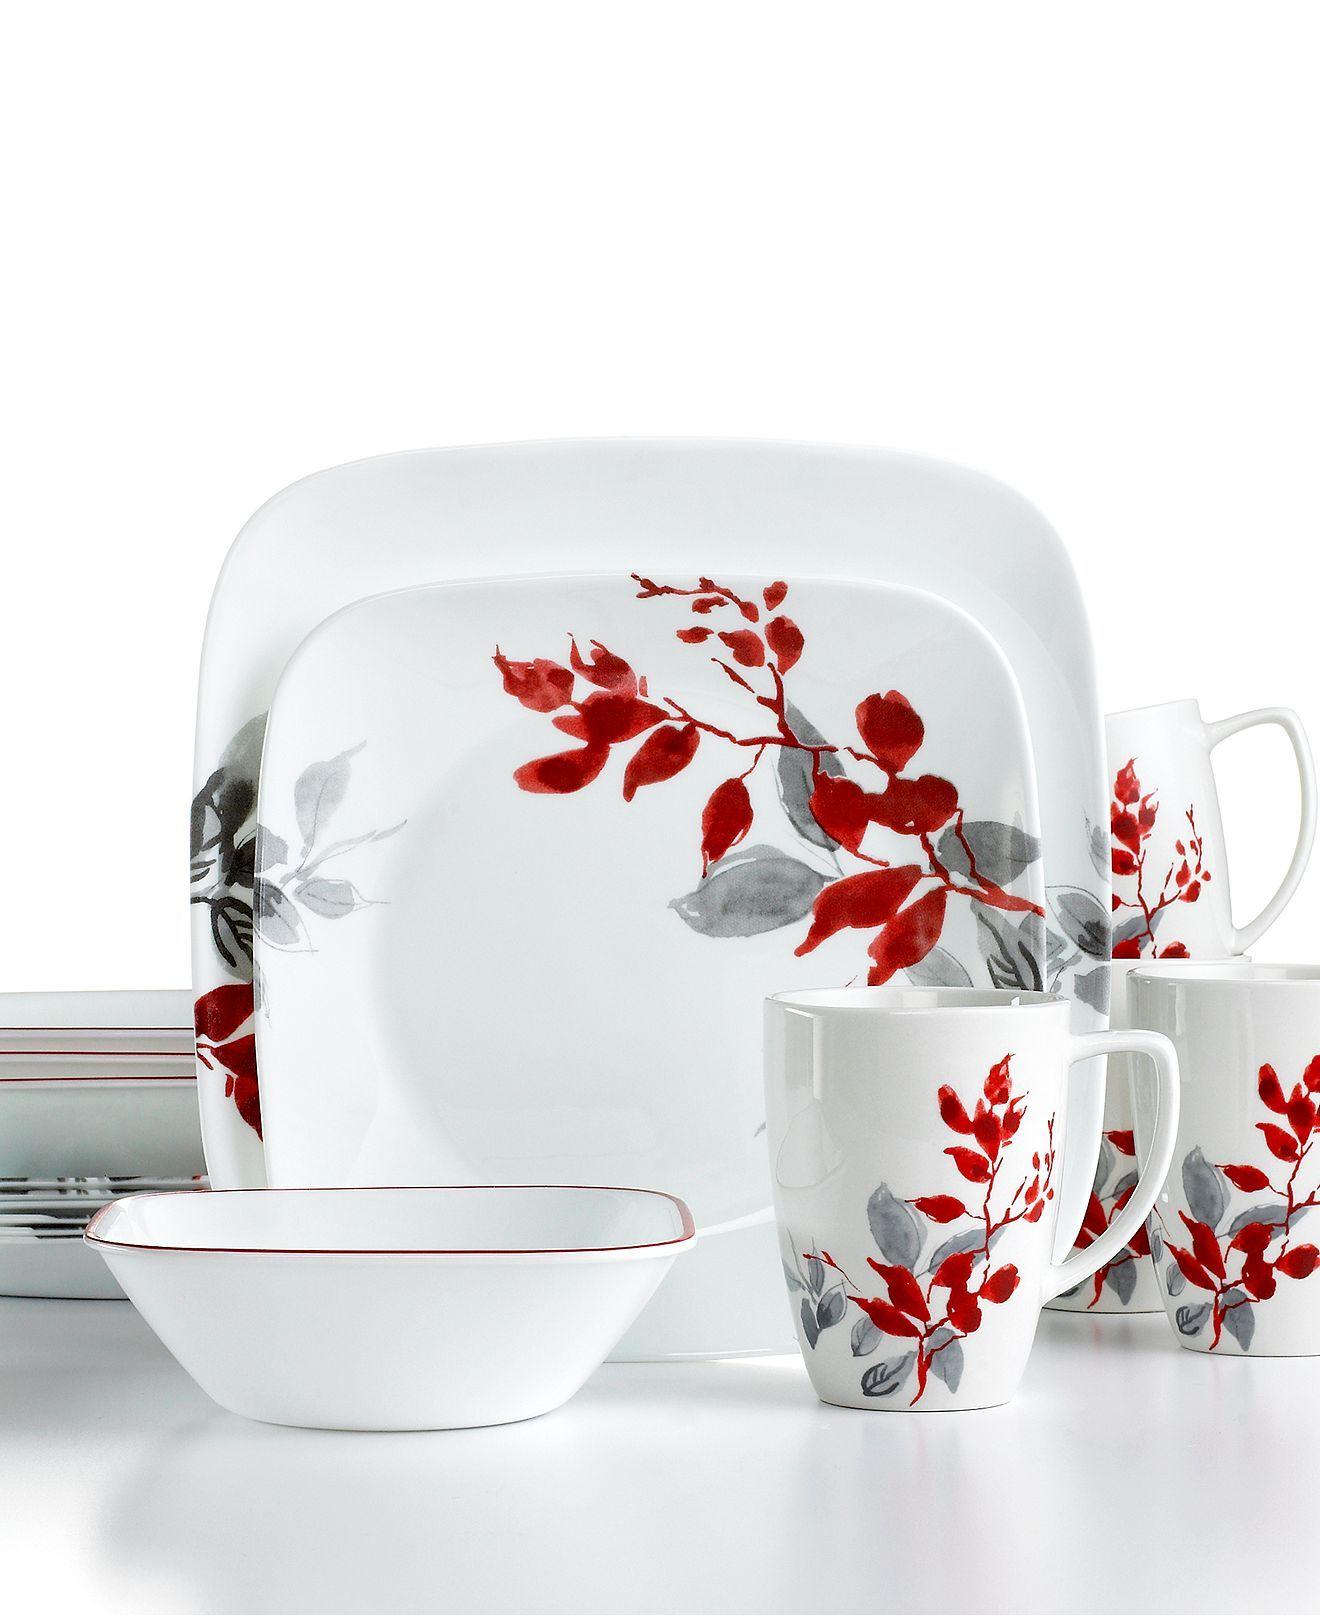 corelle kyoto leaves square 16 pc set service for 4 dinnerware